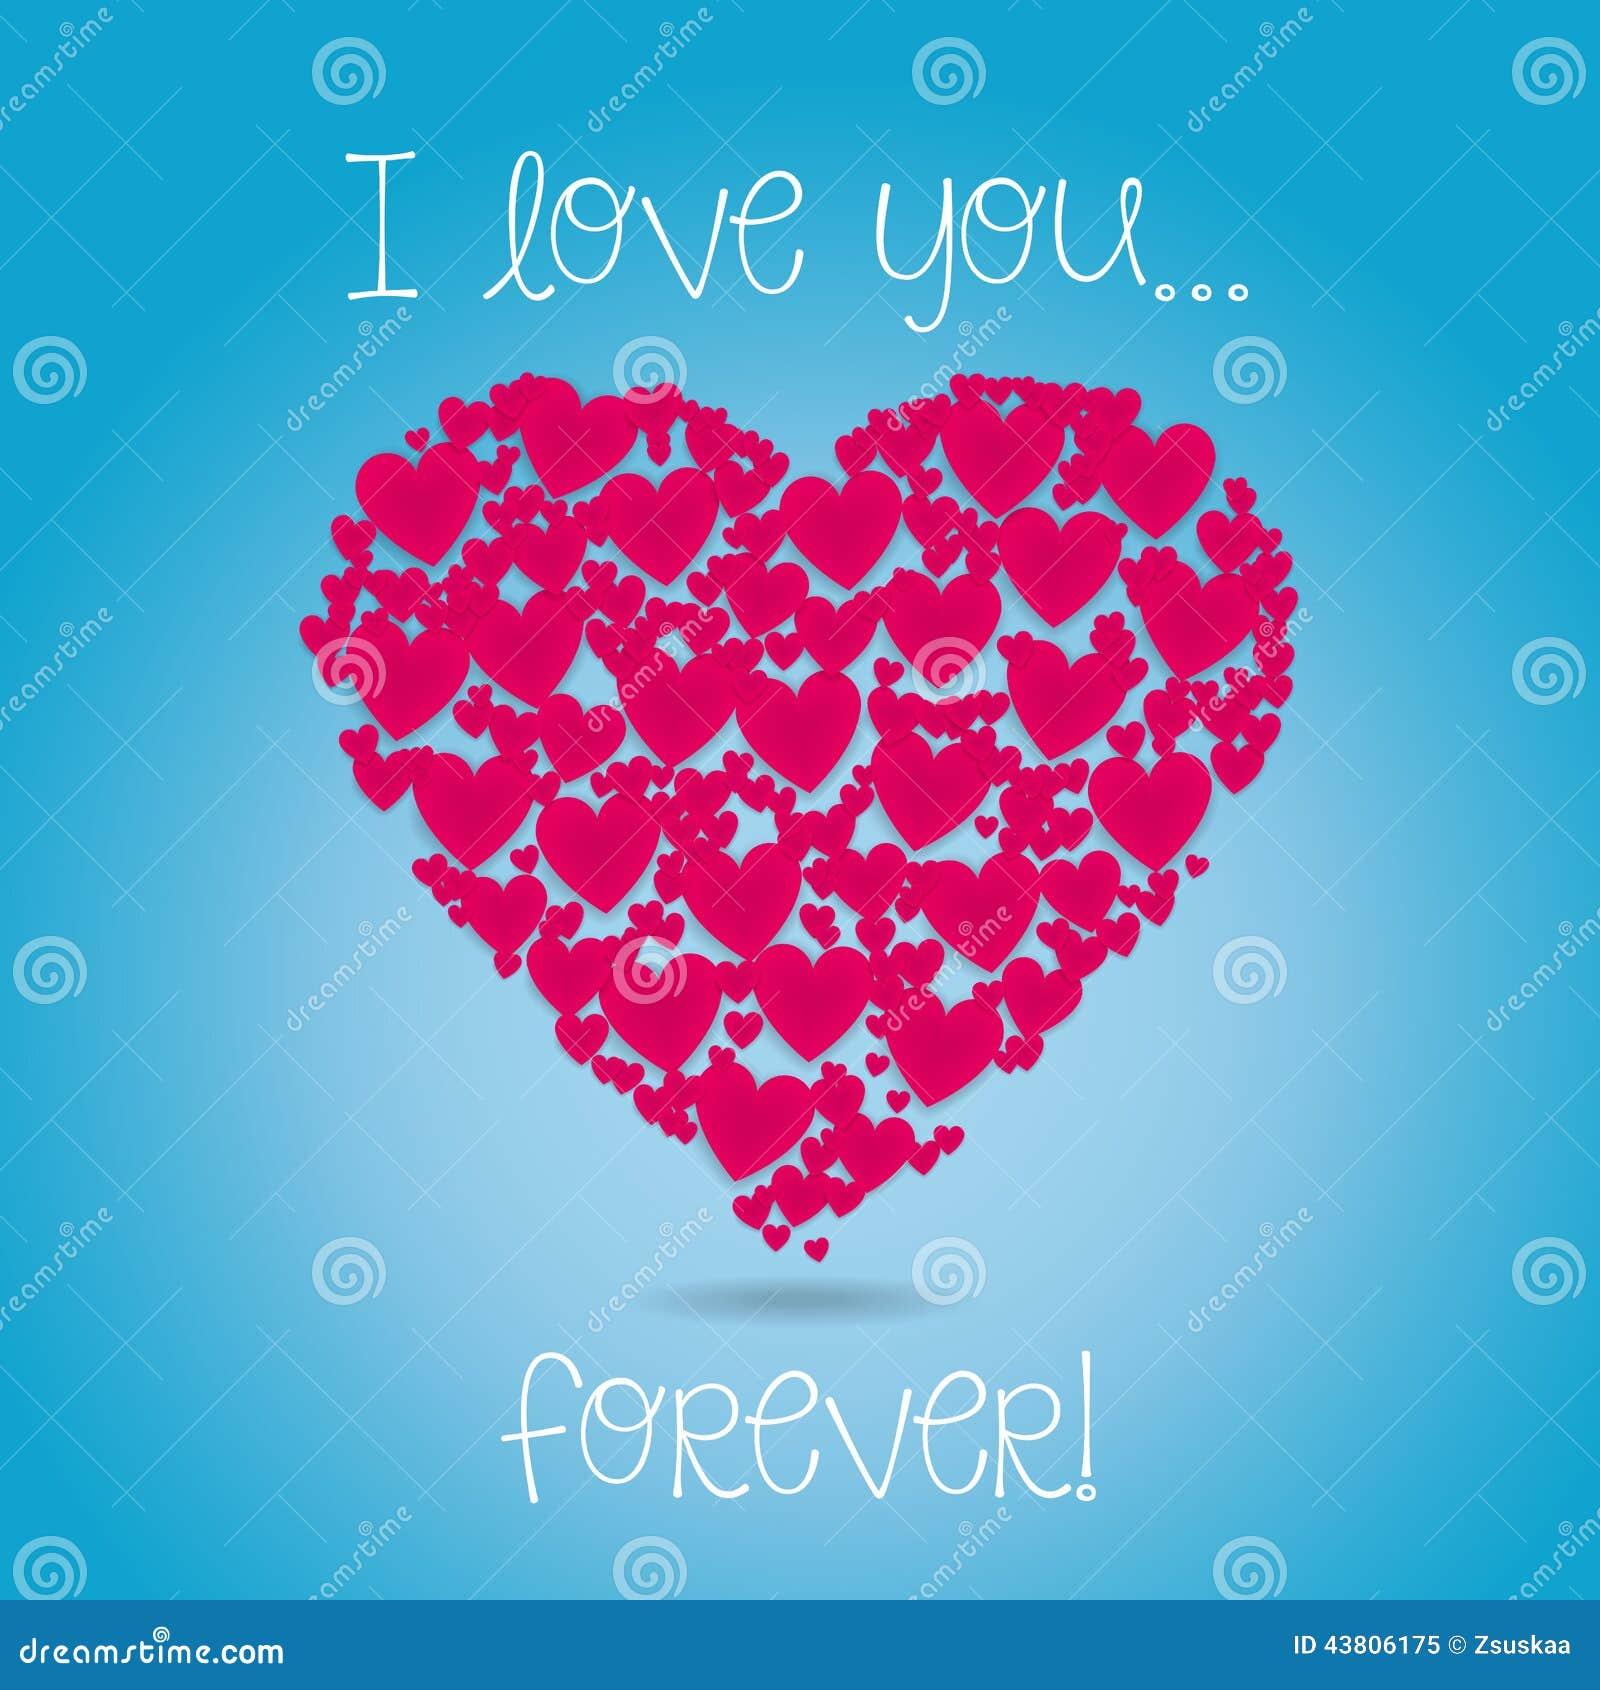 Hearts Stock Vector Illustration Of Truelove Sizes 43806175